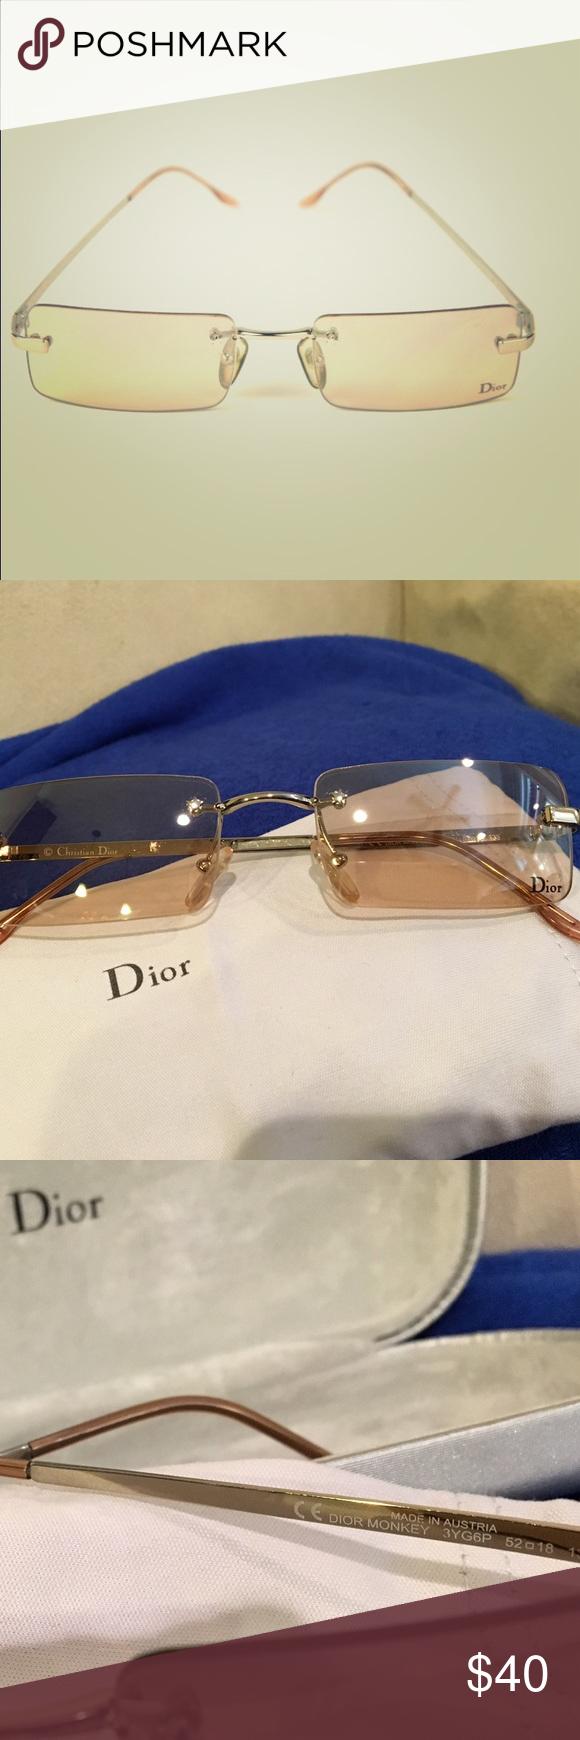 3ef90b9ea66f Christian Dior authentic Monkey 3YG6P sunglasses Christian Dior authentic  Monkey 3YG6P sunglasses. Made in Austria. Rimless peach lenses.